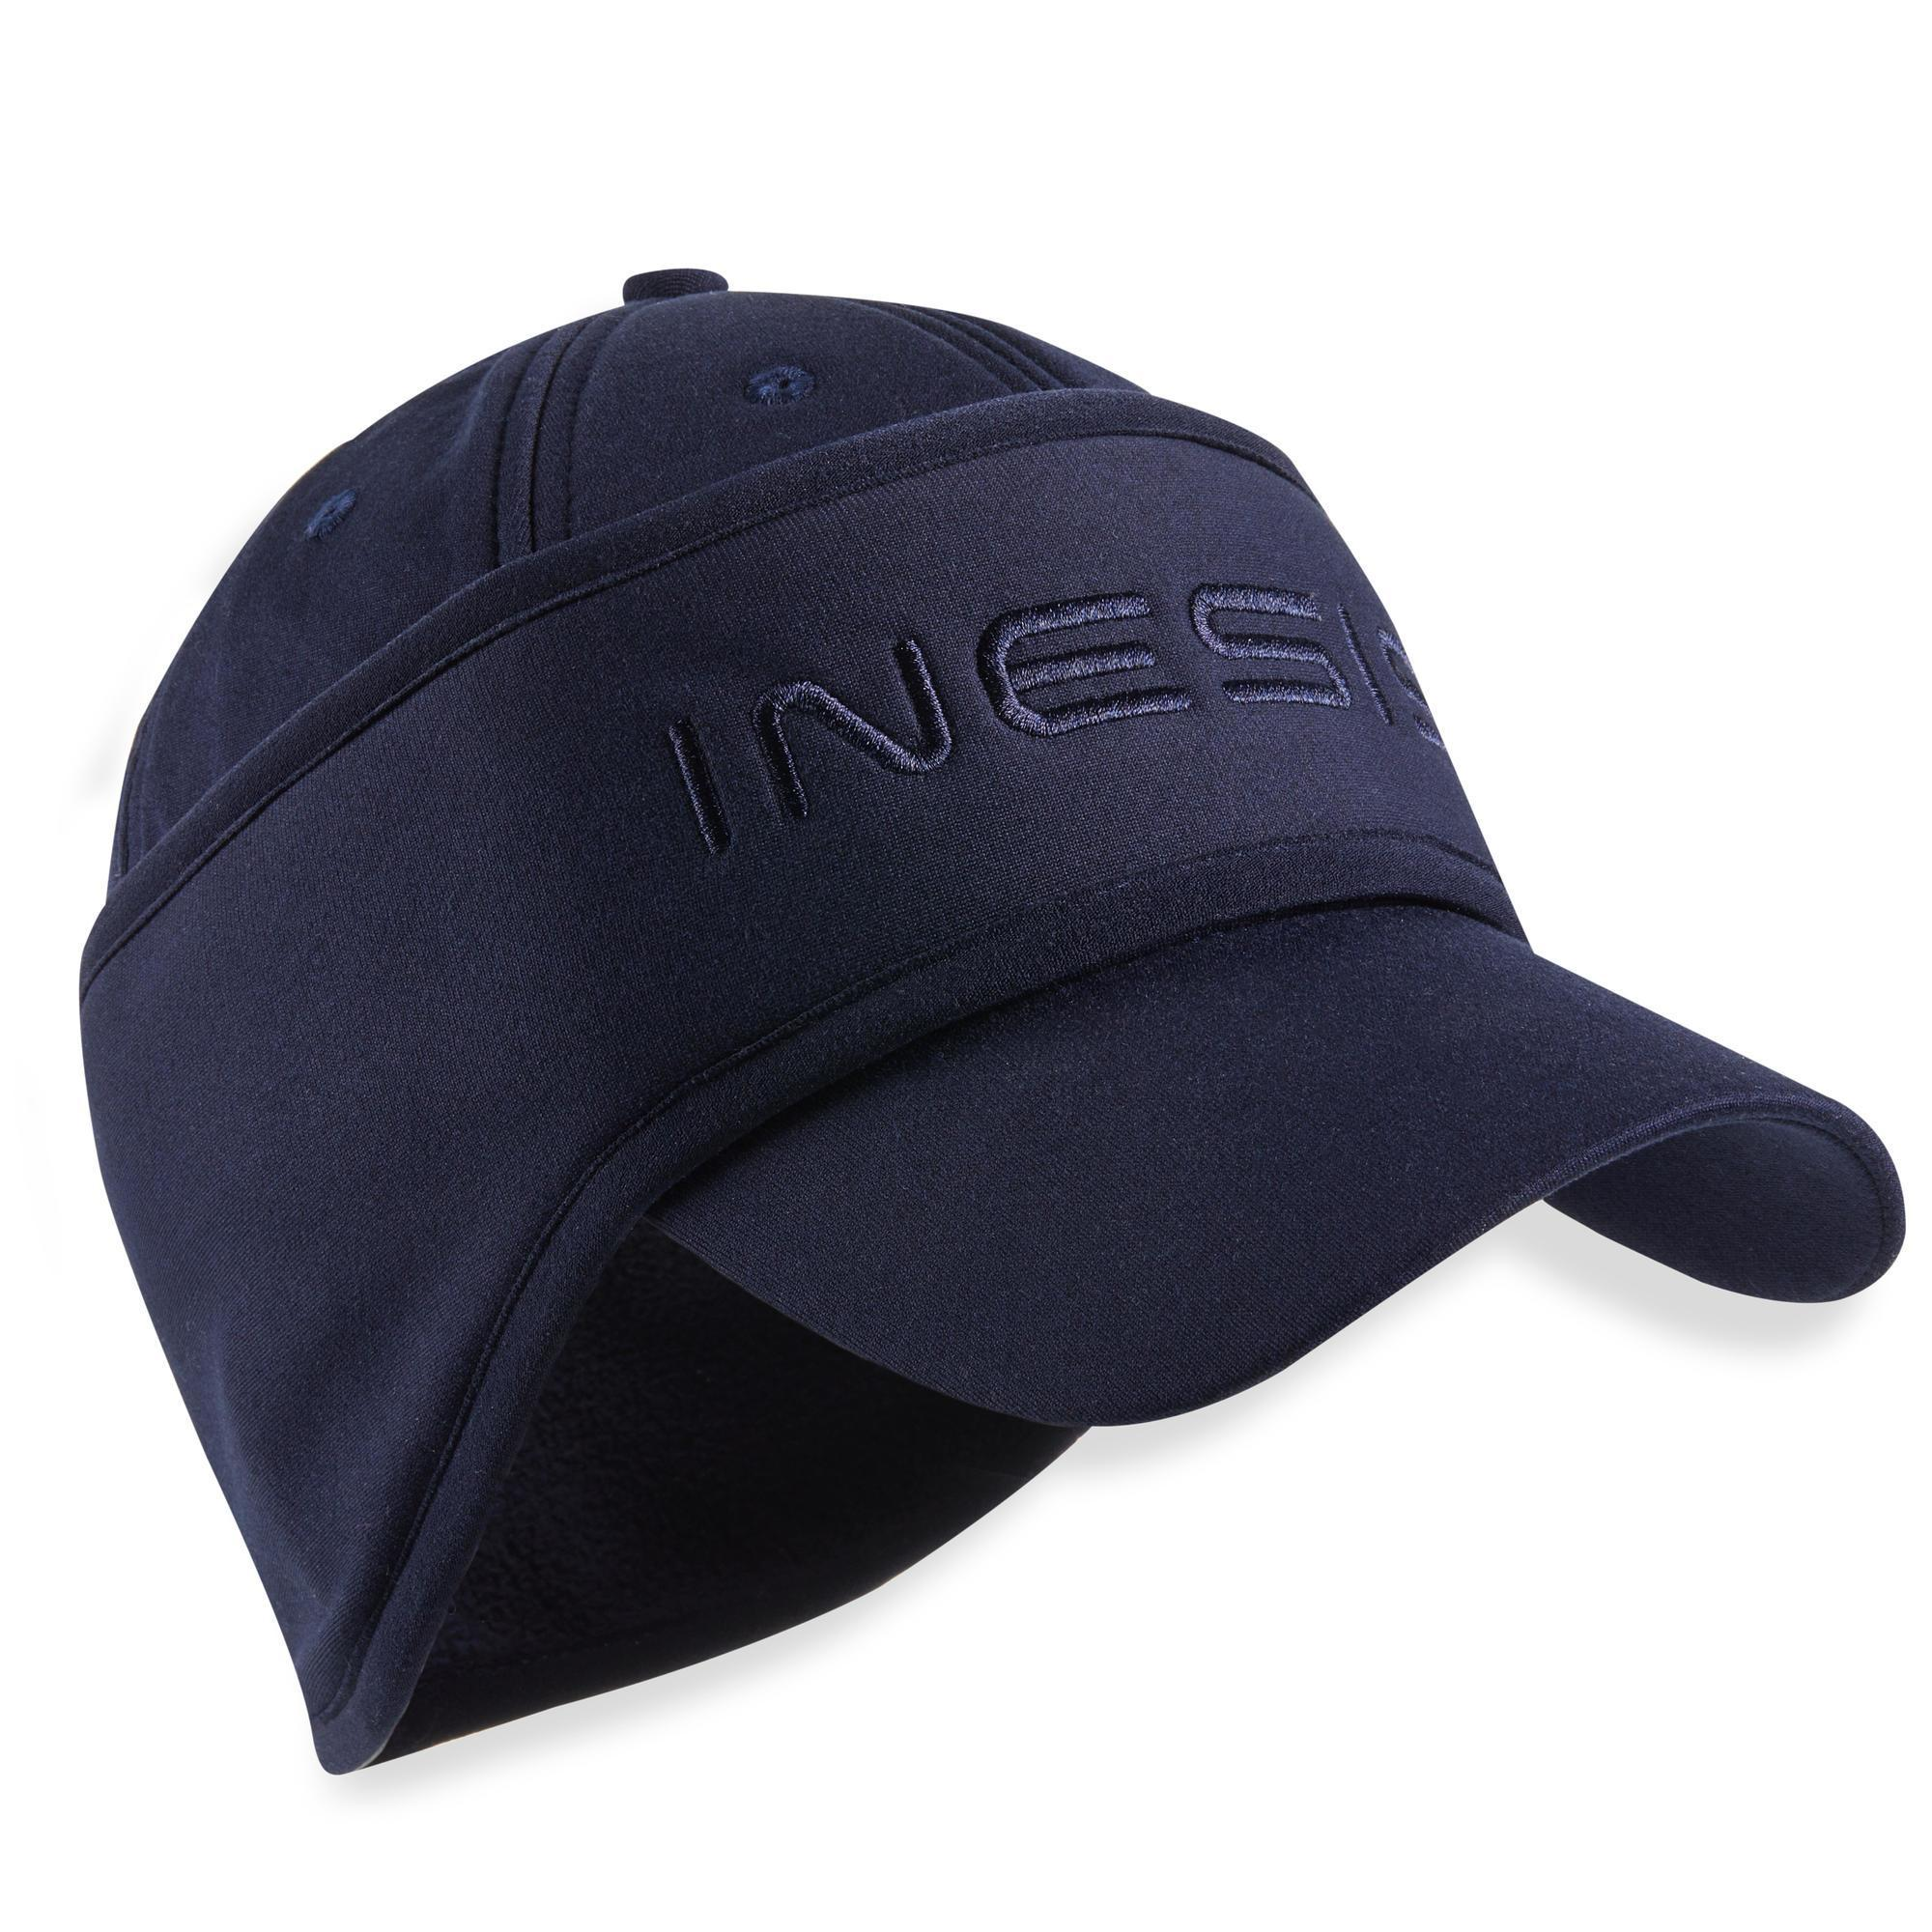 Golf Cap Stirnband warm Herren marineblau | Accessoires > Mützen | INESIS